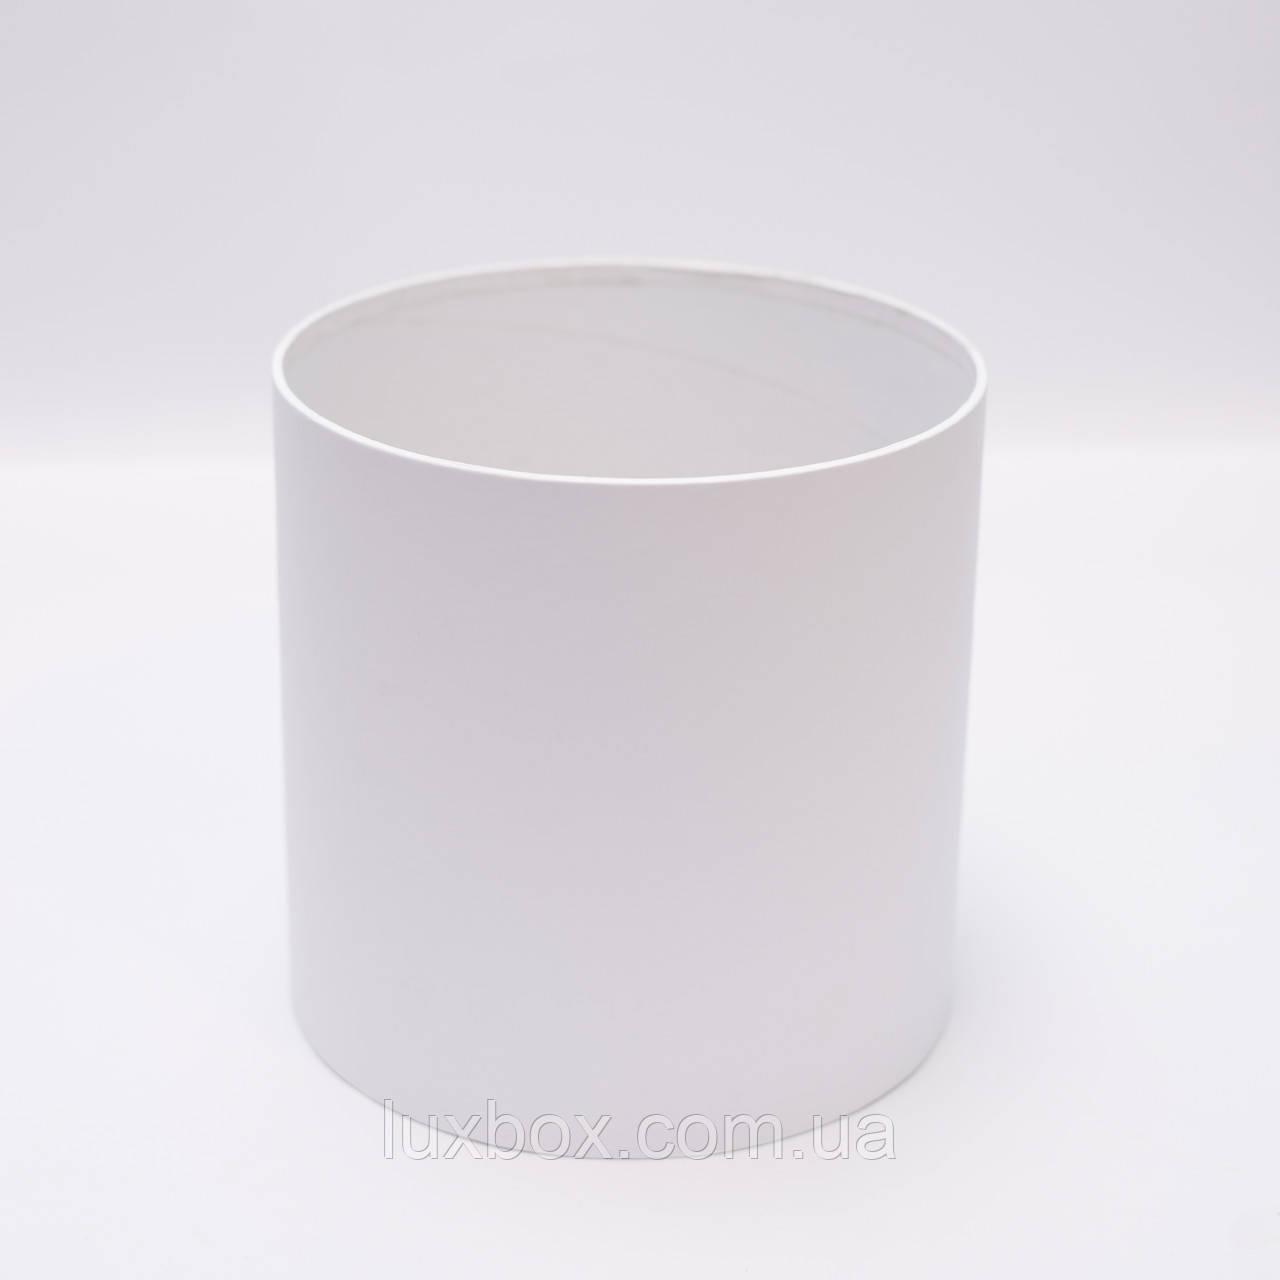 Шляпна коробка h16/d16 без кришки